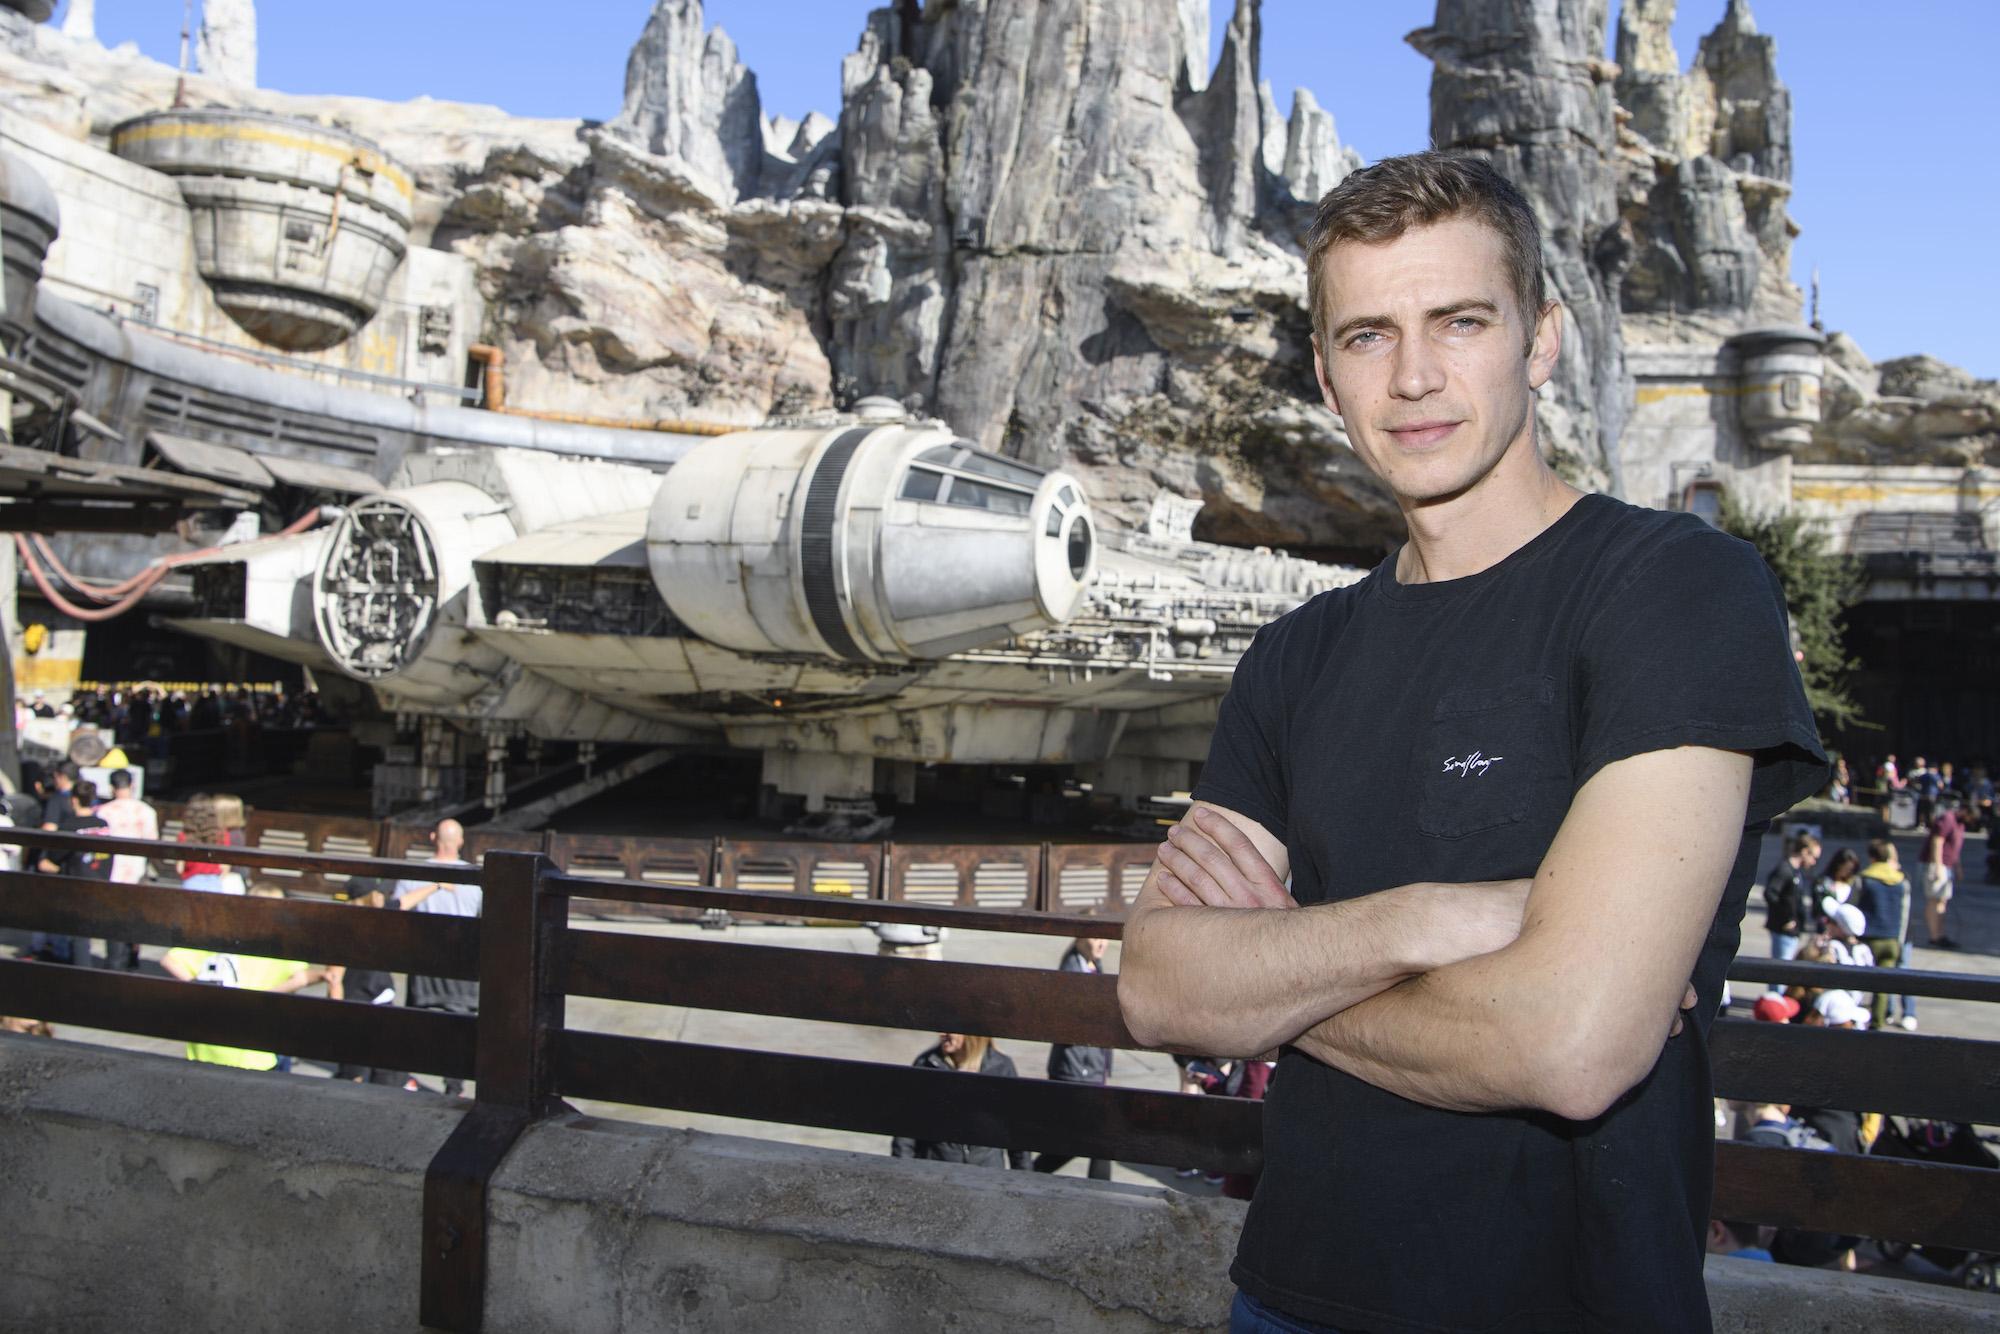 Hayden Christensen in front of the Millennium Falcon: Smugglers Run at Star Wars: Galaxy's Edge at Disneyland Park on Oct. 29, 2019